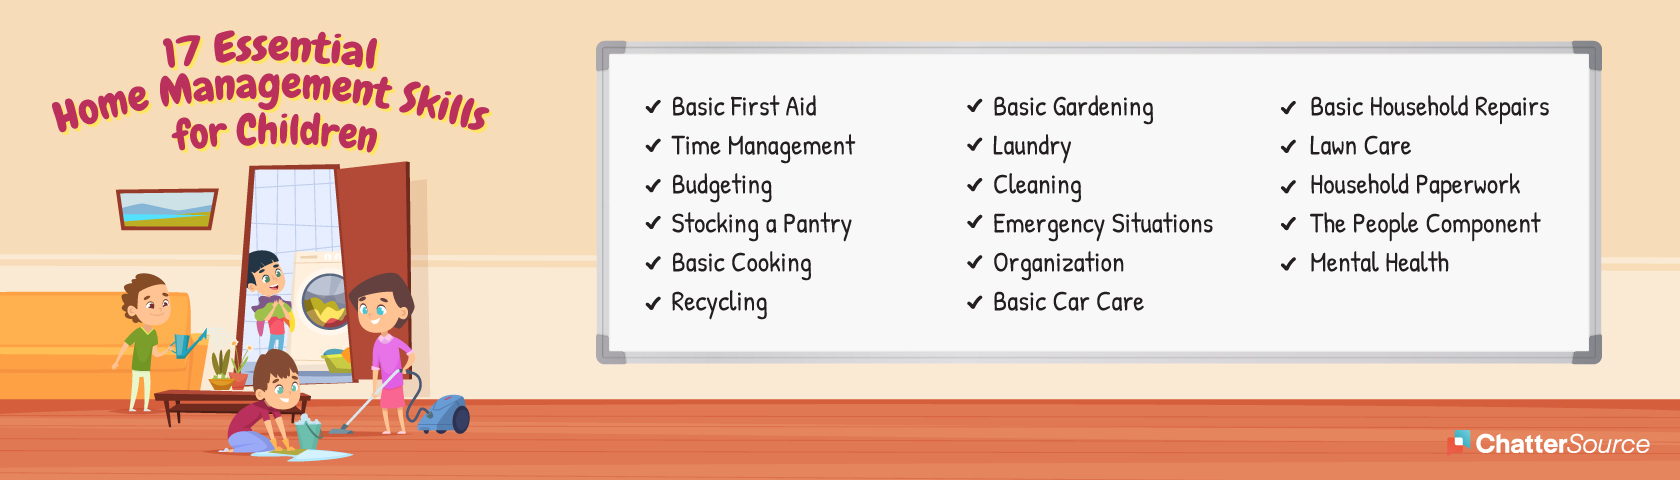 Home Management Skills infographic